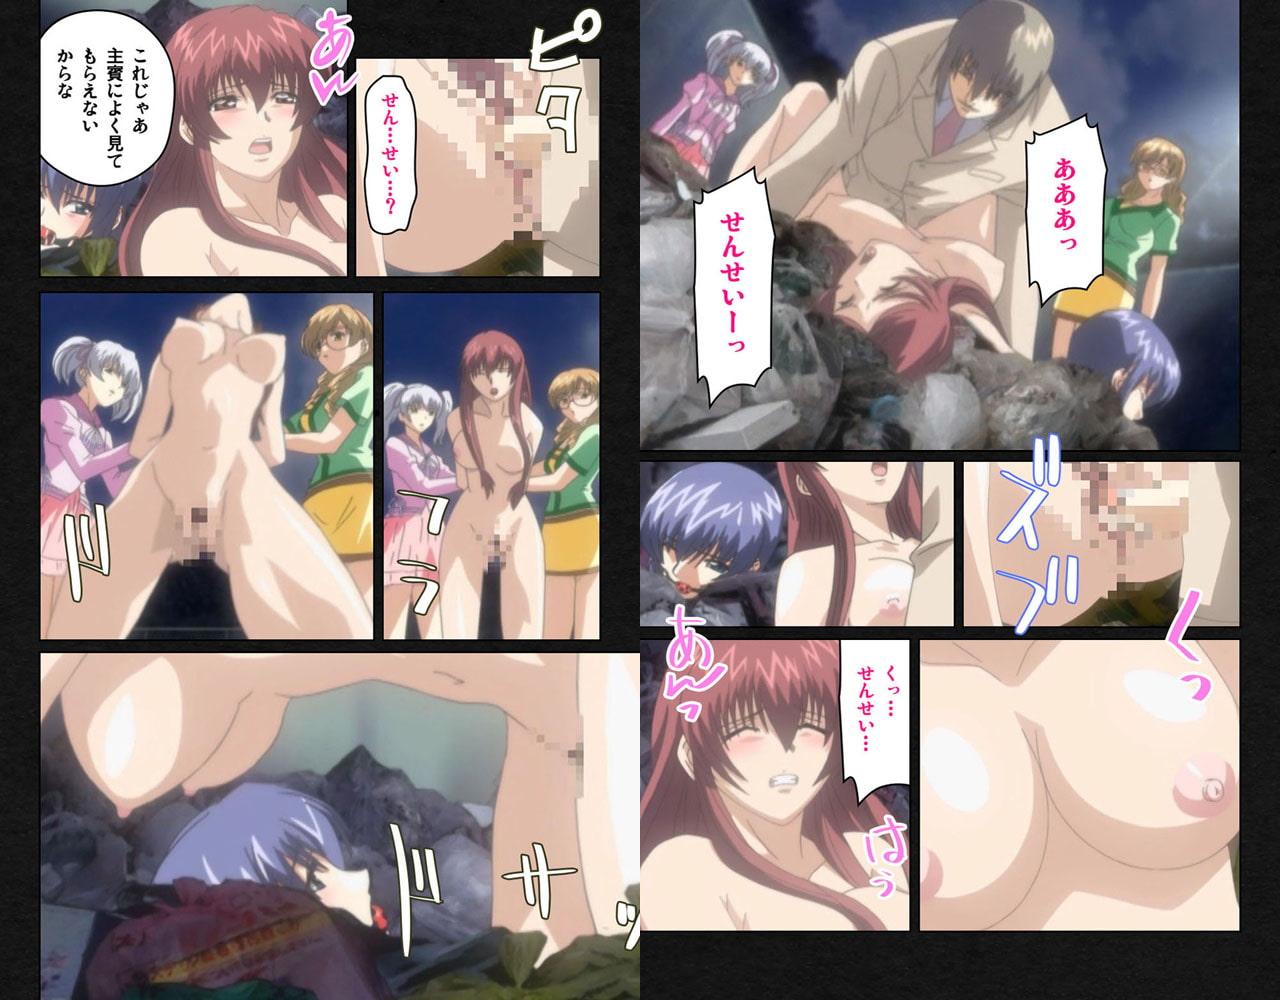 【フルカラー成人版】夜勤病棟・弐 ope:02 完全版